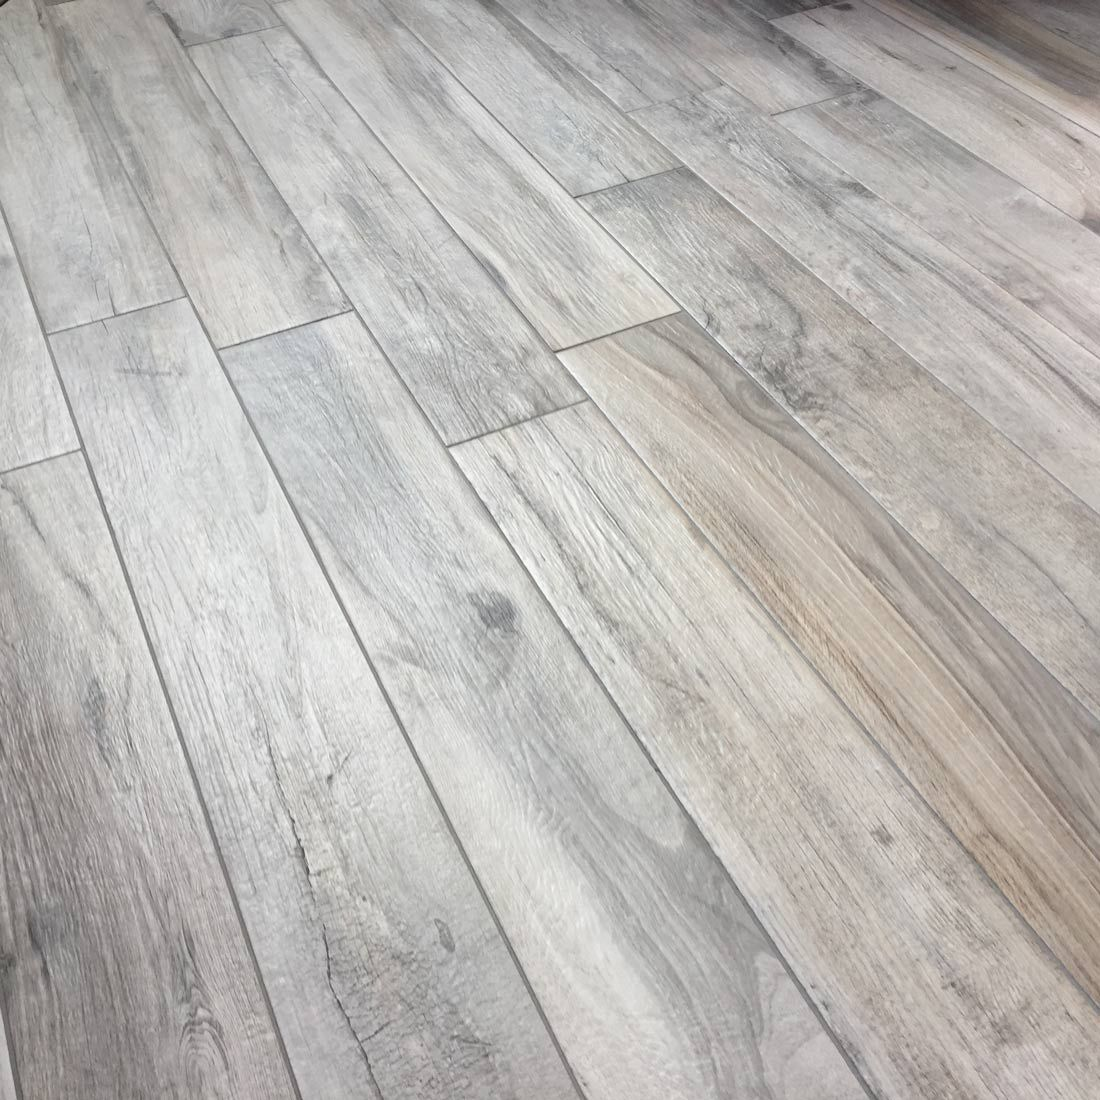 15x100cm Soft Greige Wood Tile By Rondine Ceramic Wood Tile Floor Faux Wood Tiles Grey Wood Tile